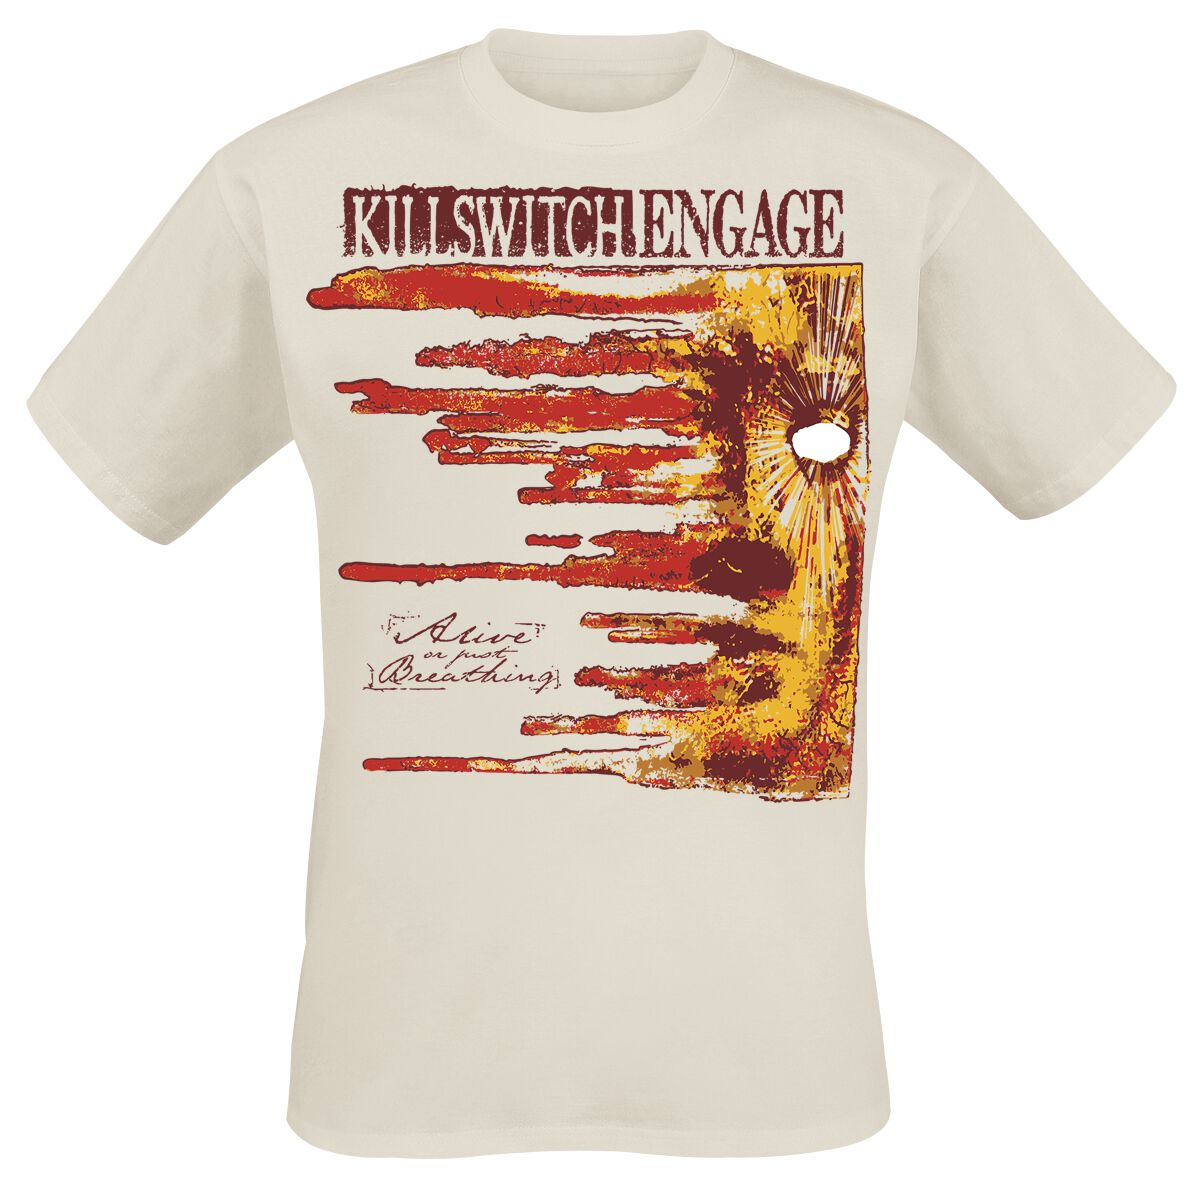 Zespoły - Koszulki - T-Shirt Killswitch Engage Alive Or Just Breathing 15th Anniversary T-Shirt naturalny - 364380